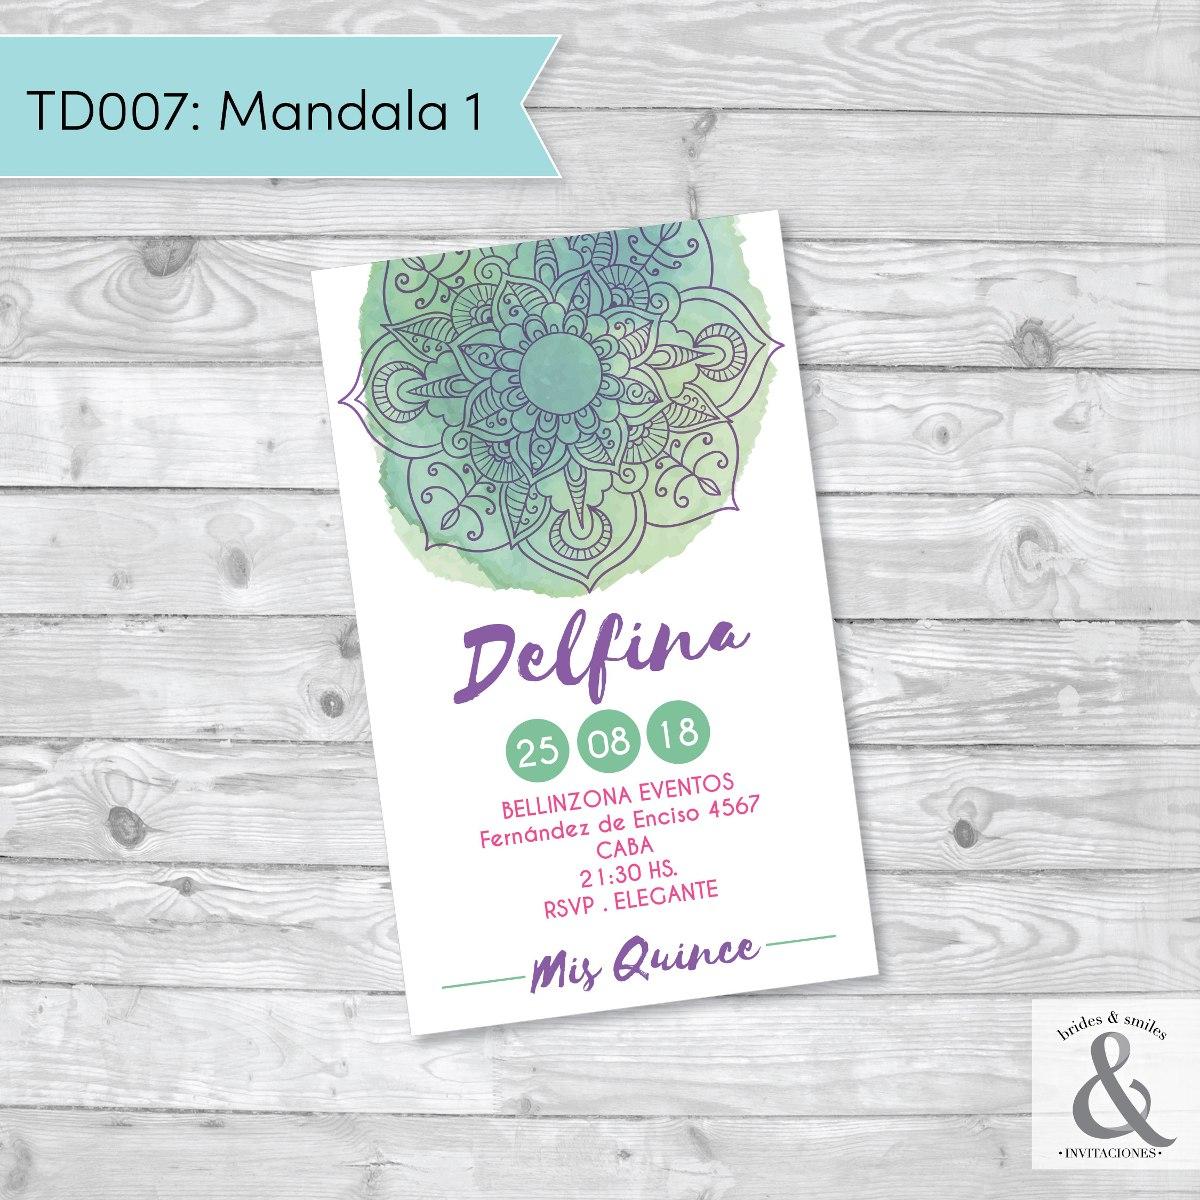 Invitación digital TD007 (Mandala 1)